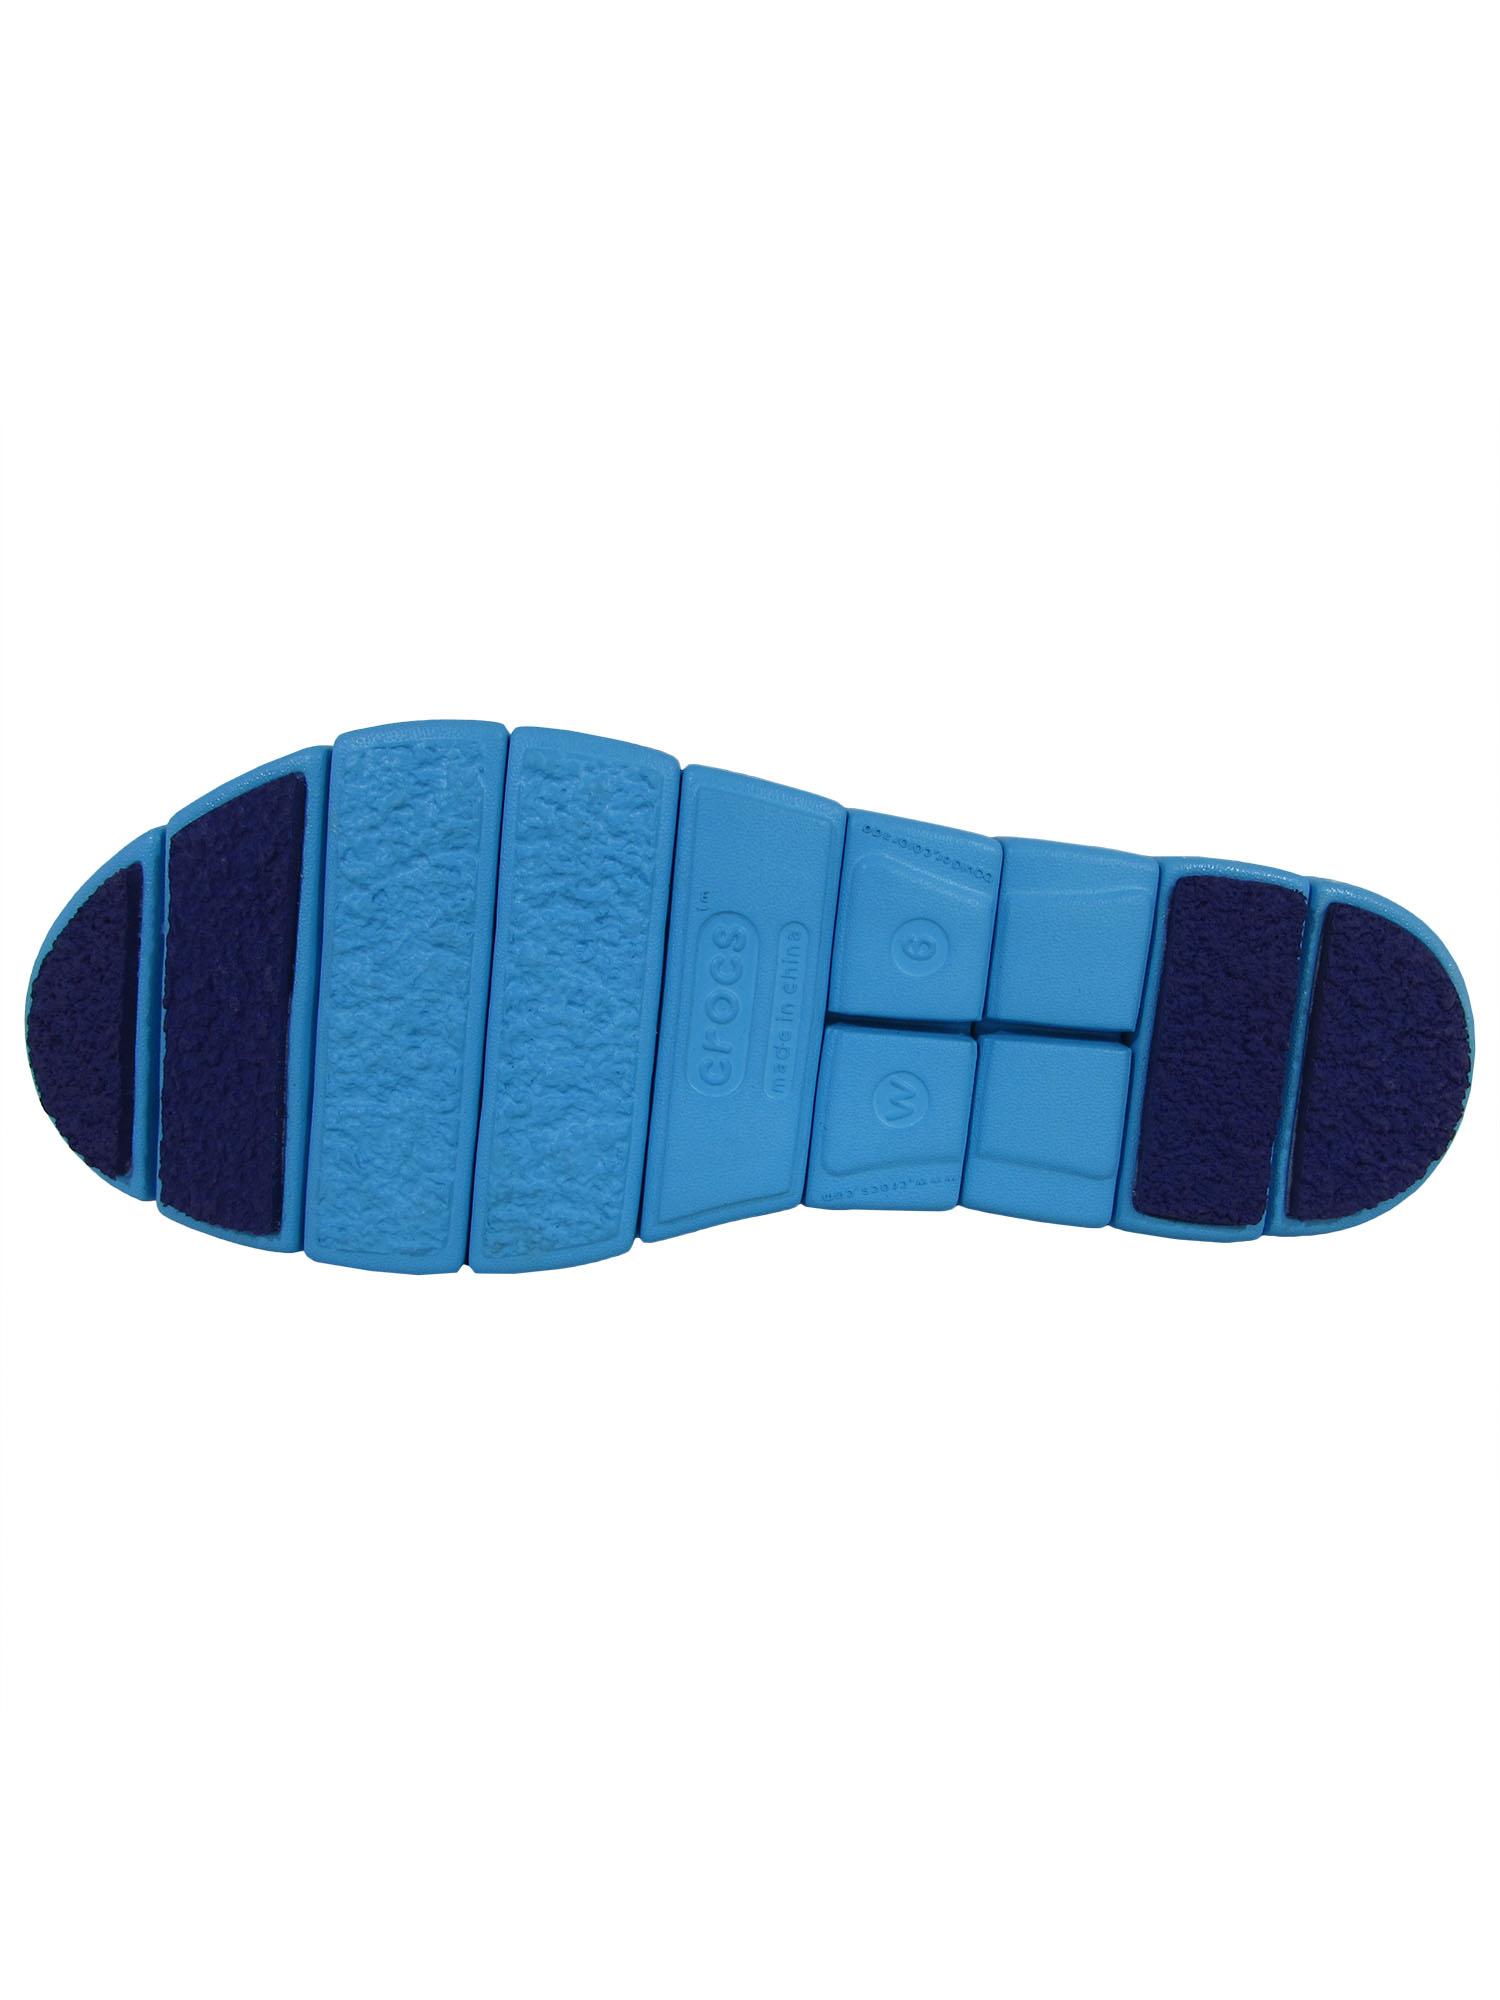 Crocs-Womens-Stretch-Sole-Flat-Slip-On-Shoes thumbnail 7